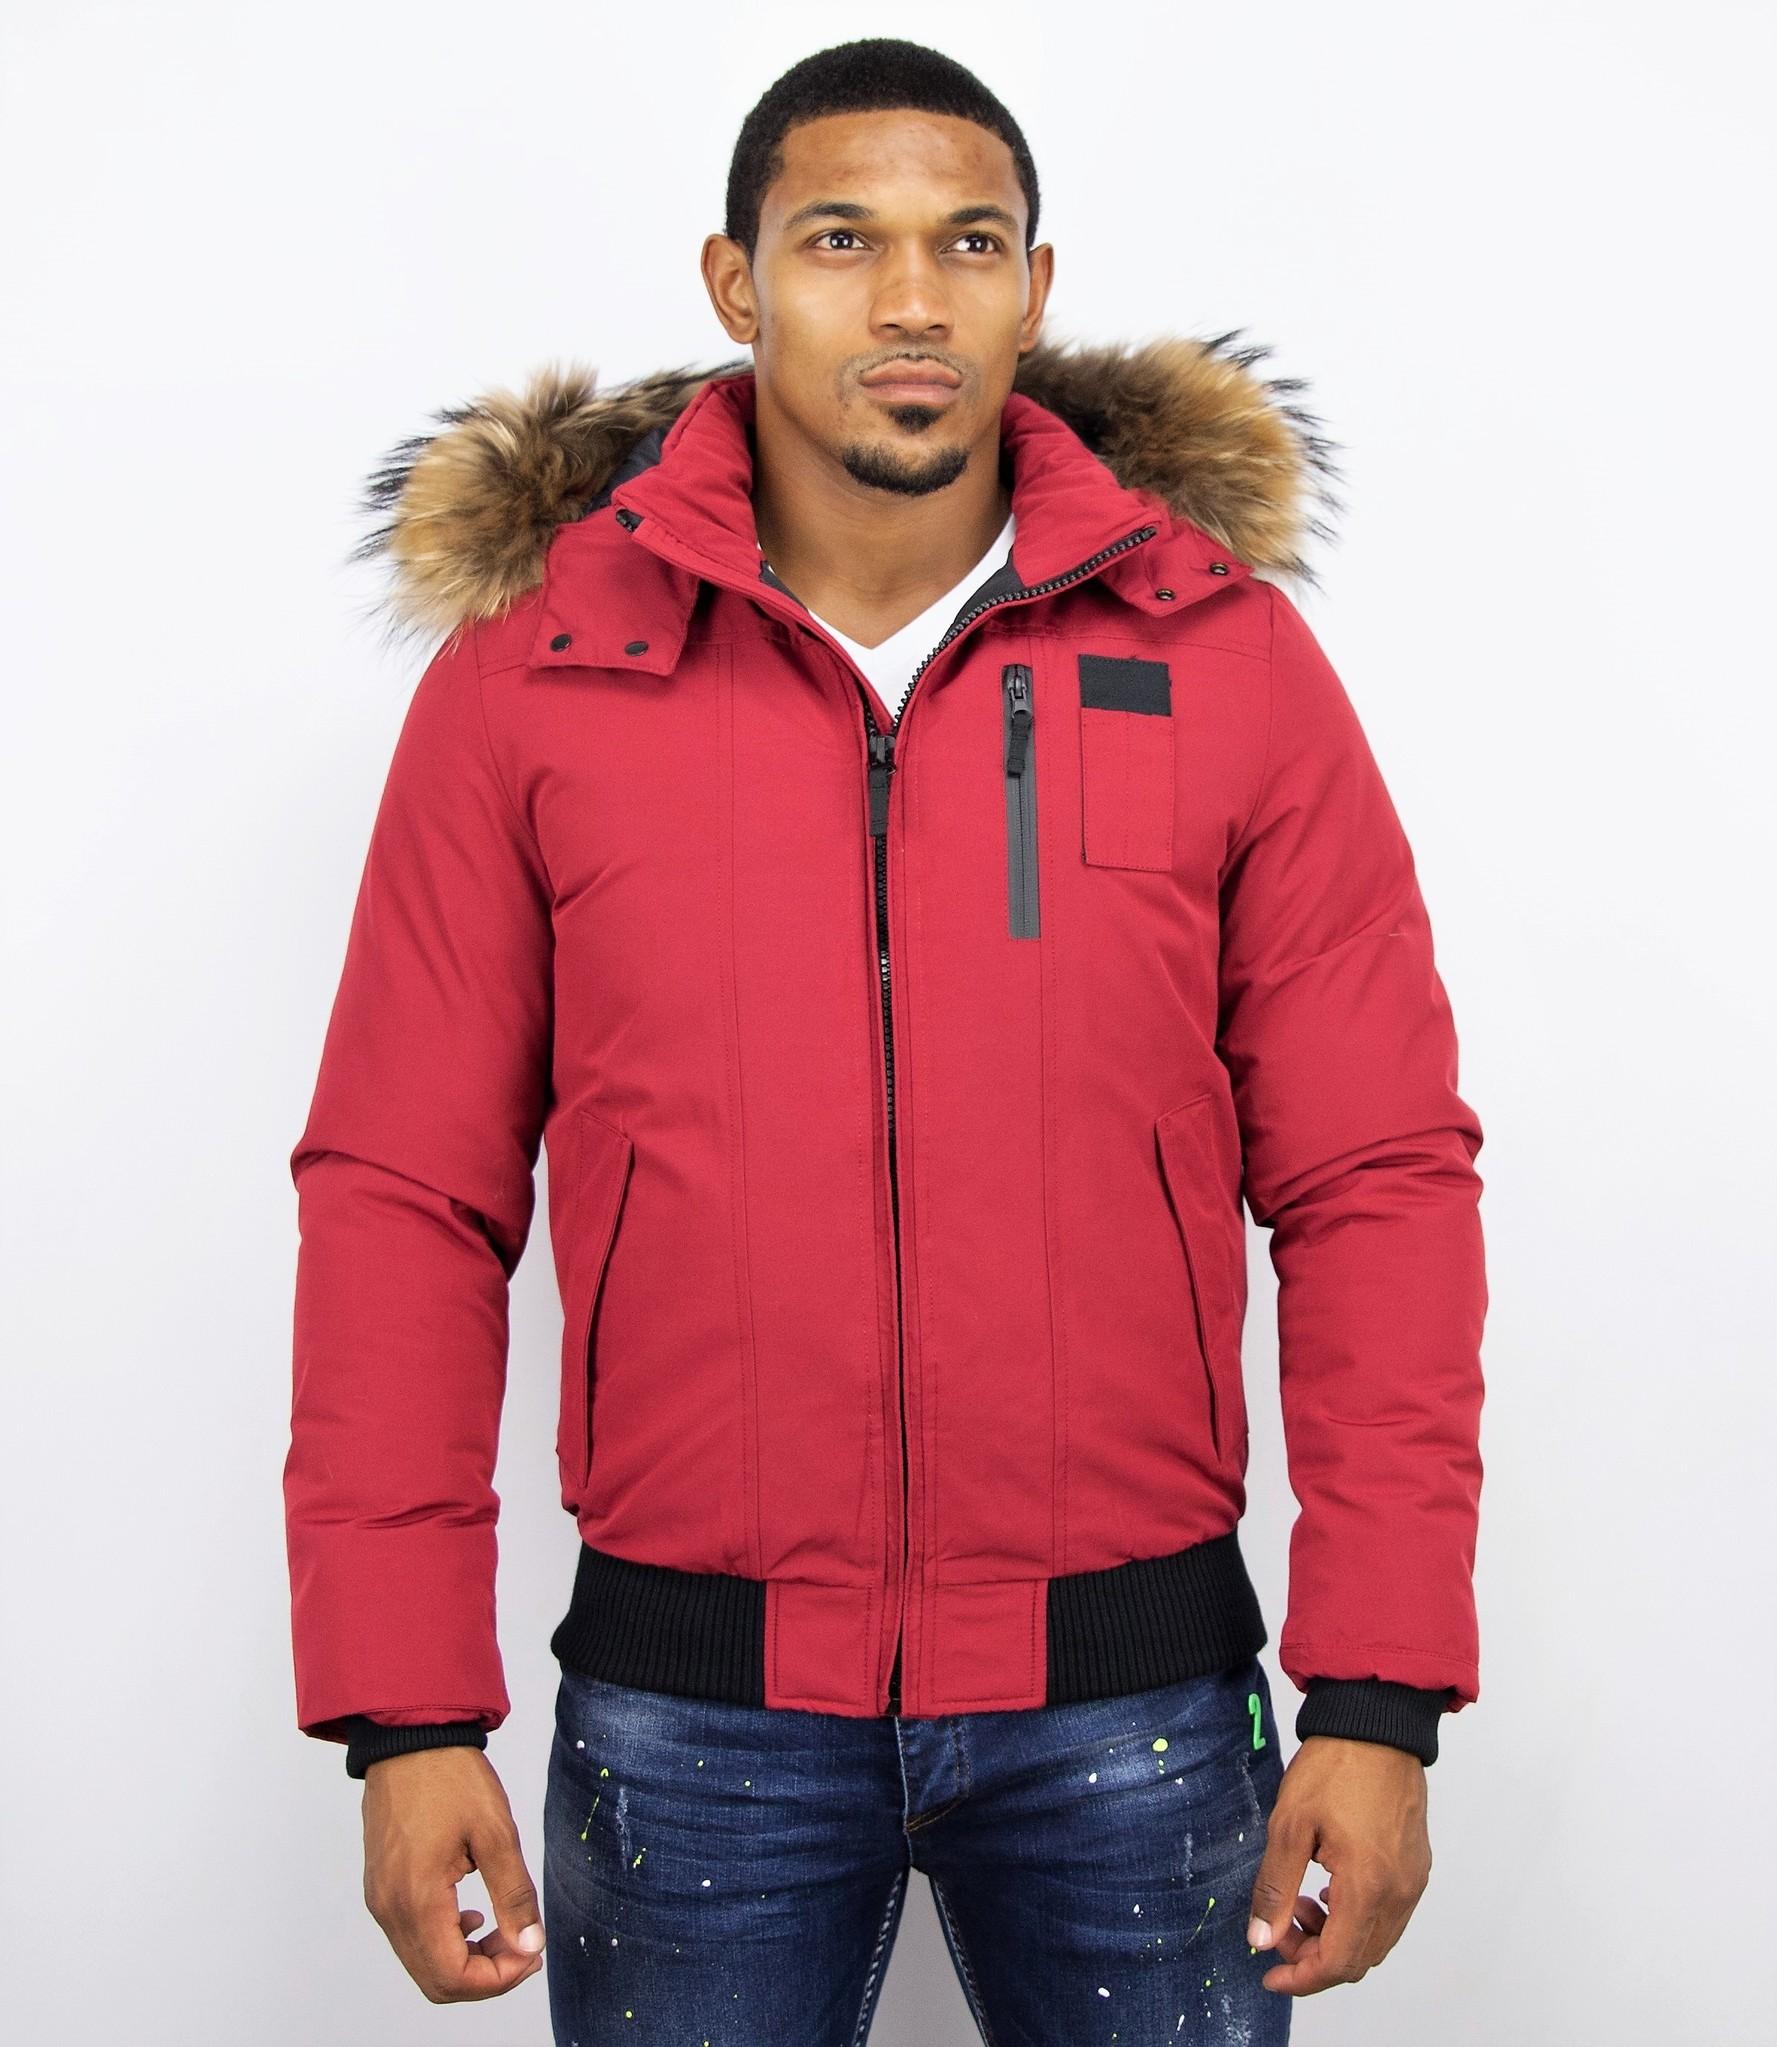 Winterjas rood| Heren Winterjas rood | Winterjas met